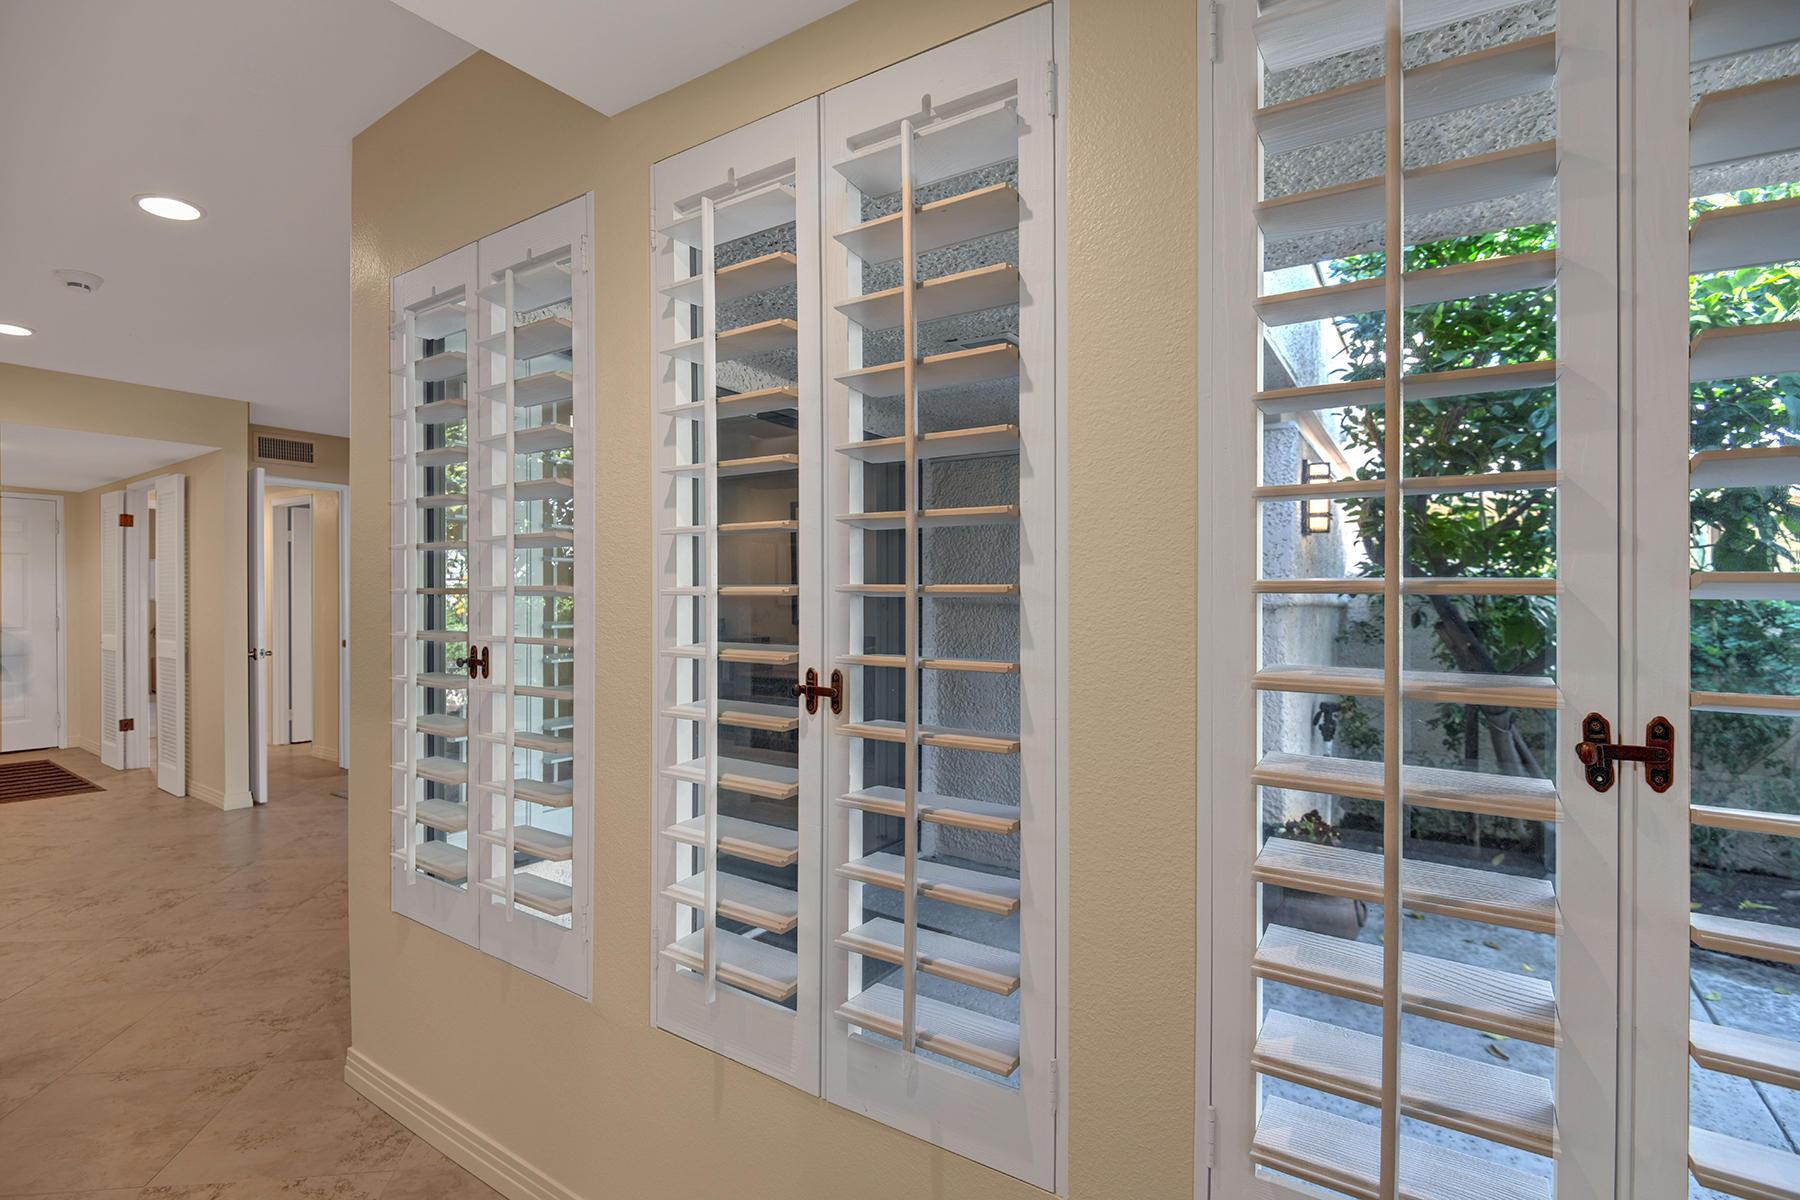 2040 Versailles Drive, Palm Springs, California 92264, 2 Bedrooms Bedrooms, ,2 BathroomsBathrooms,Residential,For Sale,2040 Versailles Drive,219037643